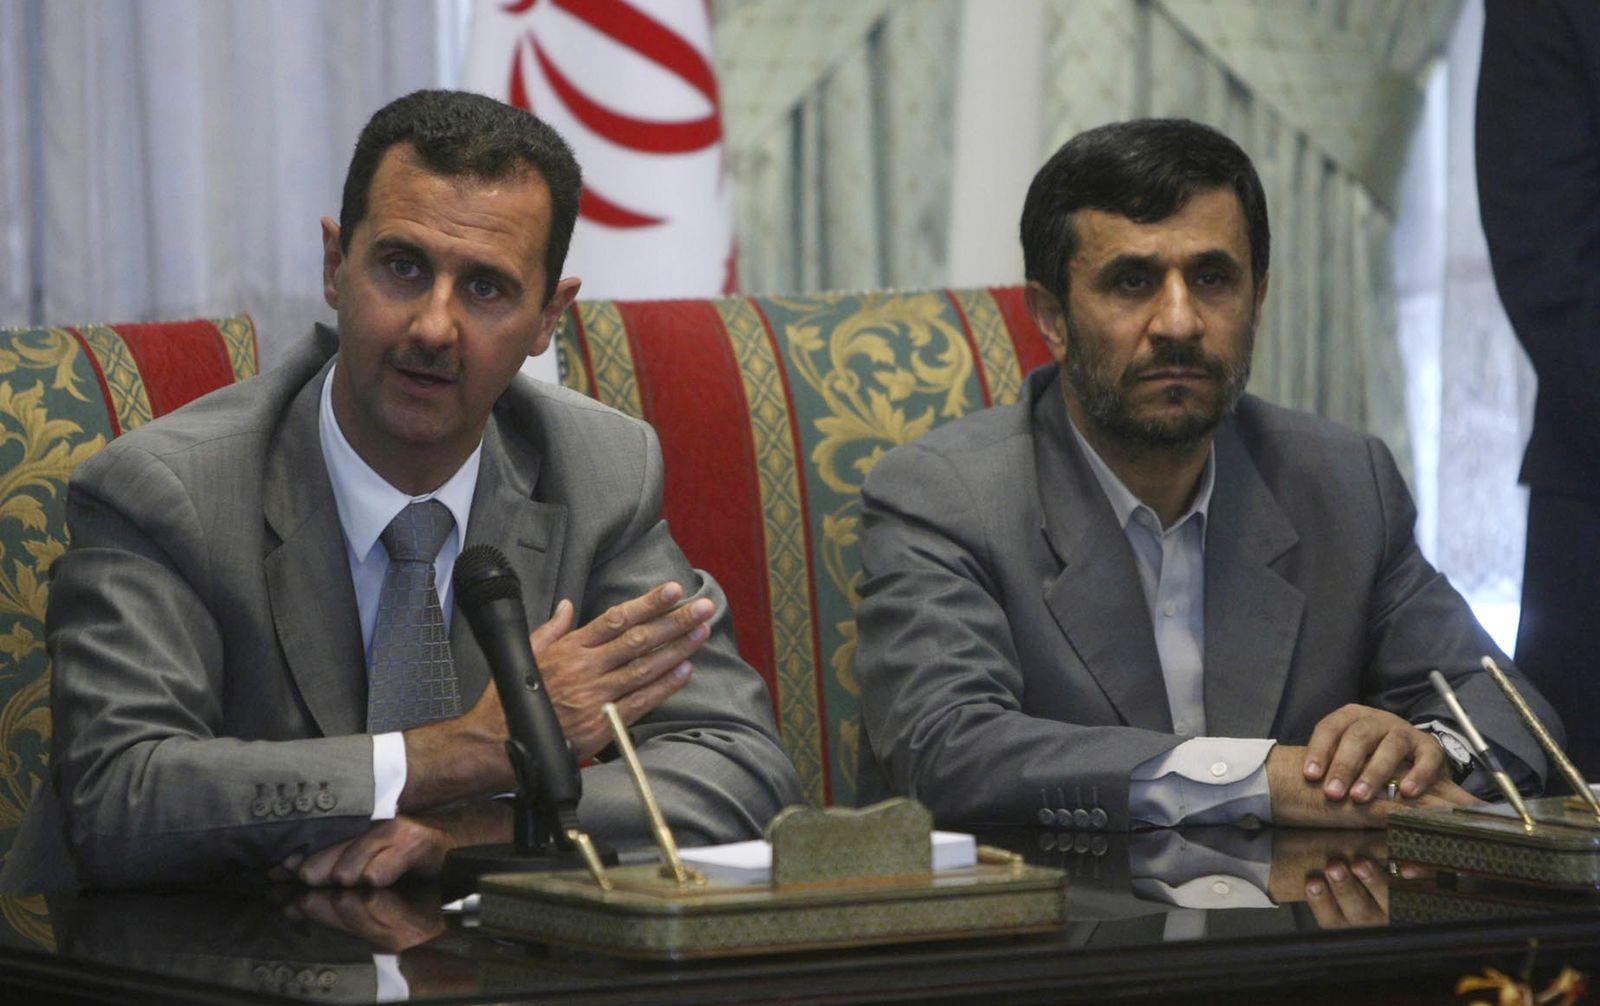 Baschar al-Assad / Mahmoud Ahmadinedschad